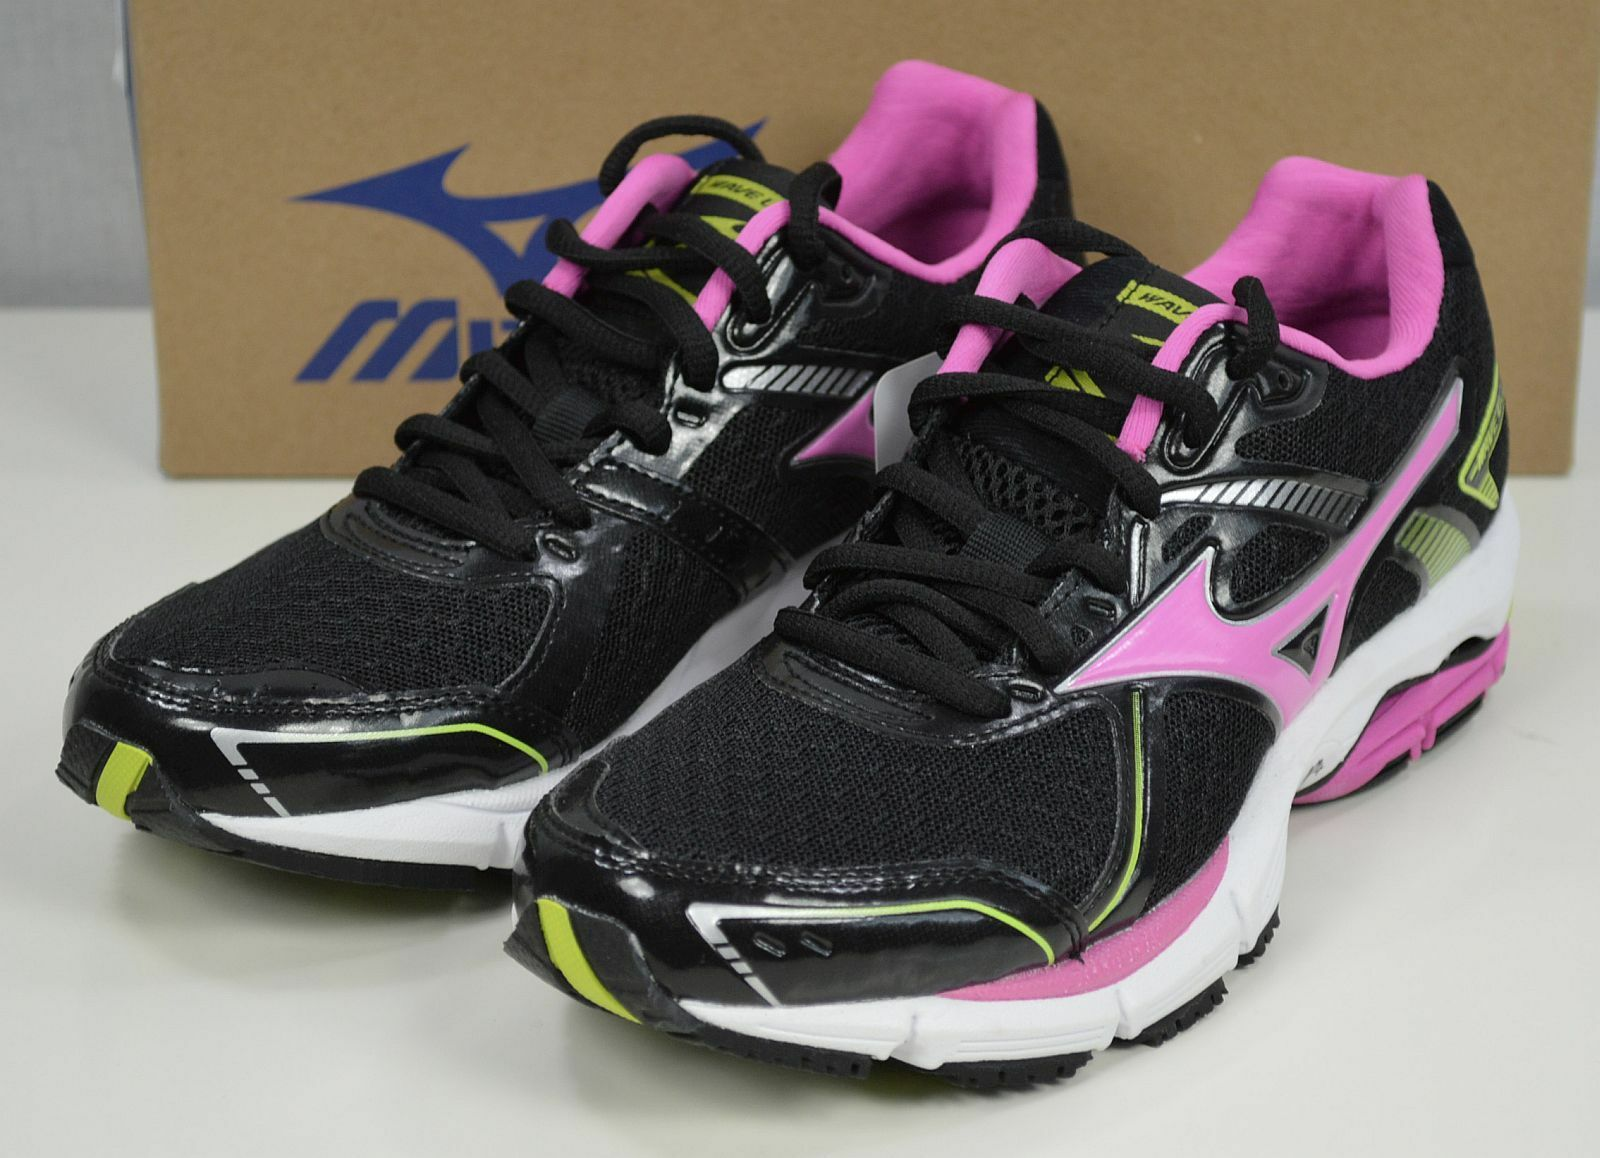 Mizuno Wave Ultima 5 (W) Damen Running Laufschuhe Damen Schuhe sale 49041705